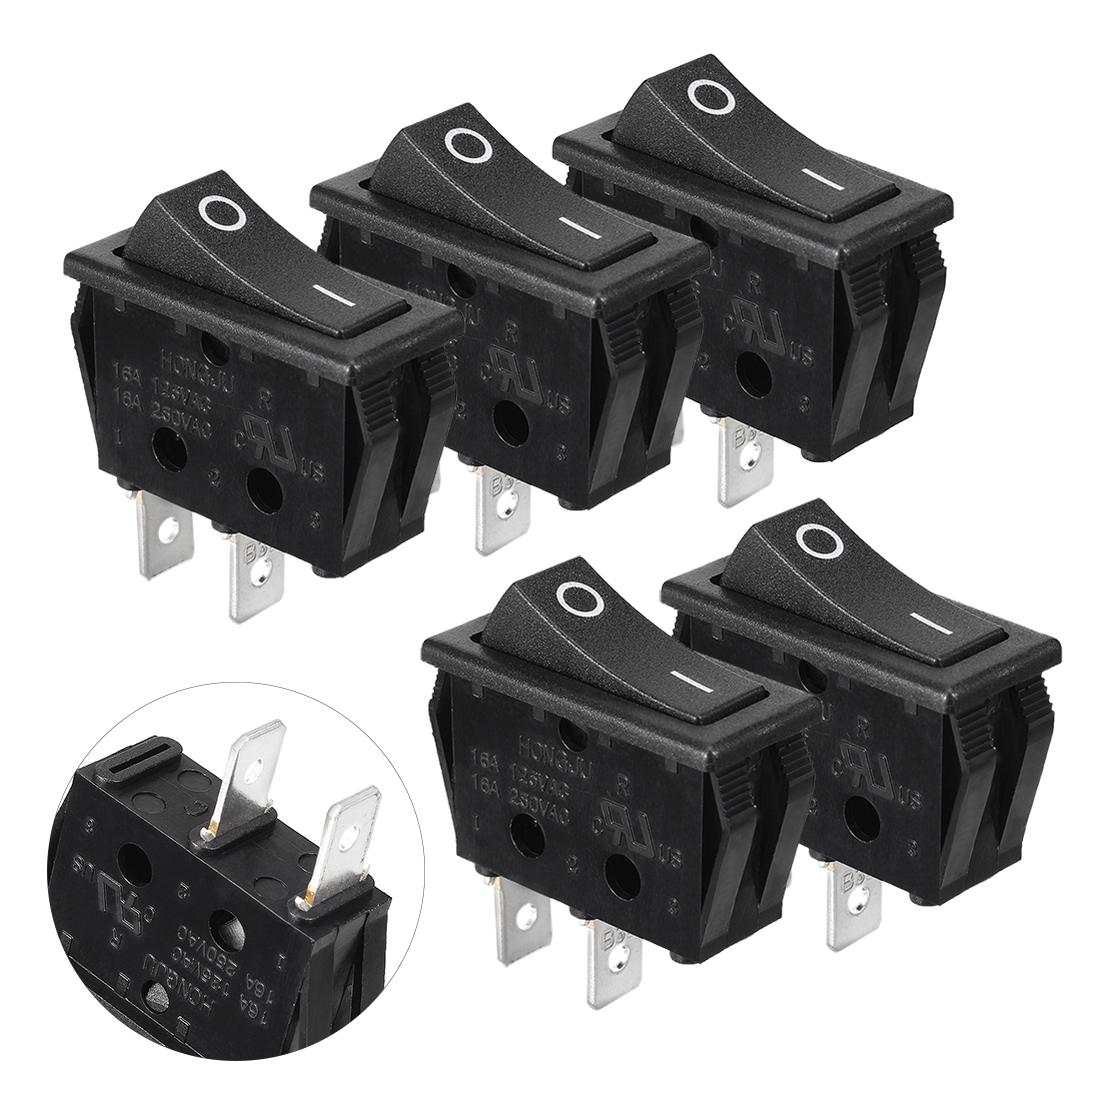 5 Pcs 2 Solder Lug Pin SPST on off Snap In Boat Rocker Switch Rectangular Black